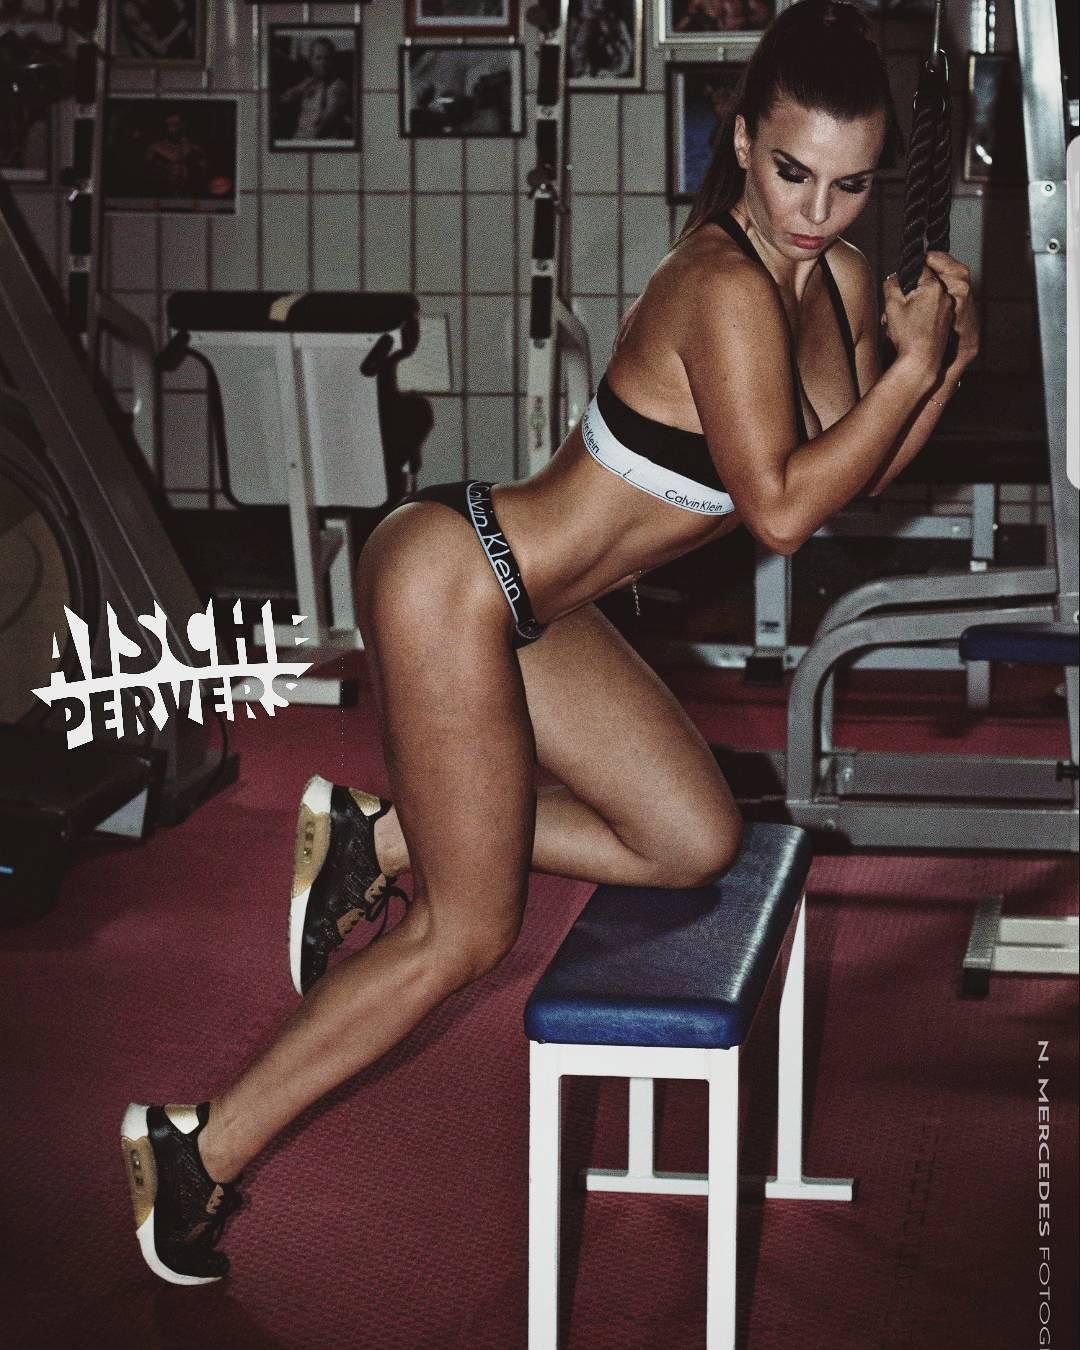 I might not be perfect, but damm I'm progressing!💪🍑💪 Free Show 28.8.17 @ funurl.de/aische #fitness #fit #fitfam #nike #airmax #calvinklein #lingerie #Workout #gym #gymfreak #sport #abs #progress #trafo #transformation #legs #booty #Motivation #healthy #lifestyle #fun #ponytail #longhair #curvygirl #curvy #strong #lift #instafit